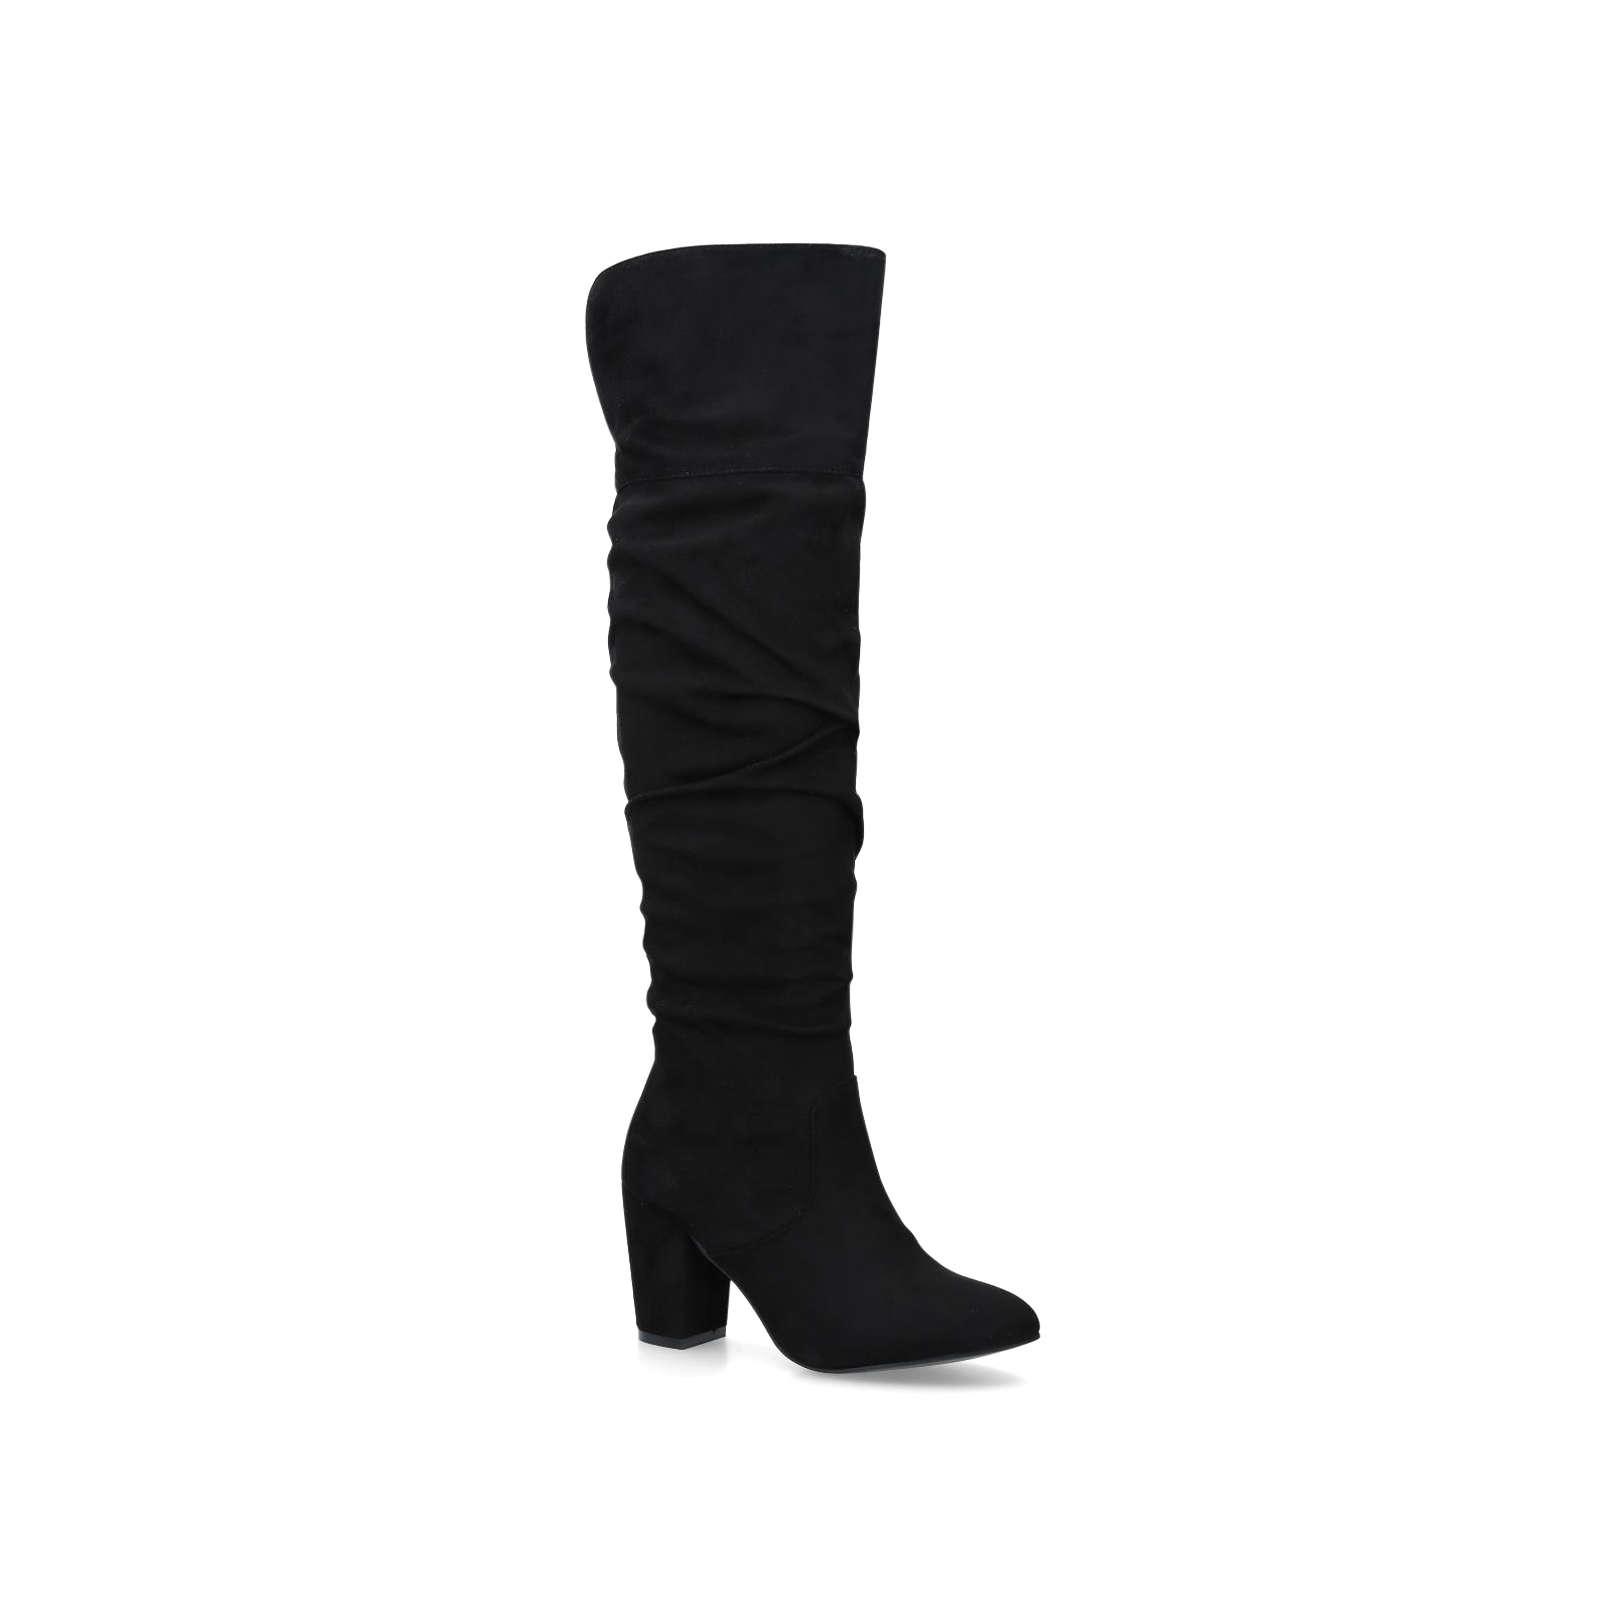 d406aebb02a HEALEY Healey Miss Kg High Leg Boots 50 Mm Heel Black Heel Over The ...